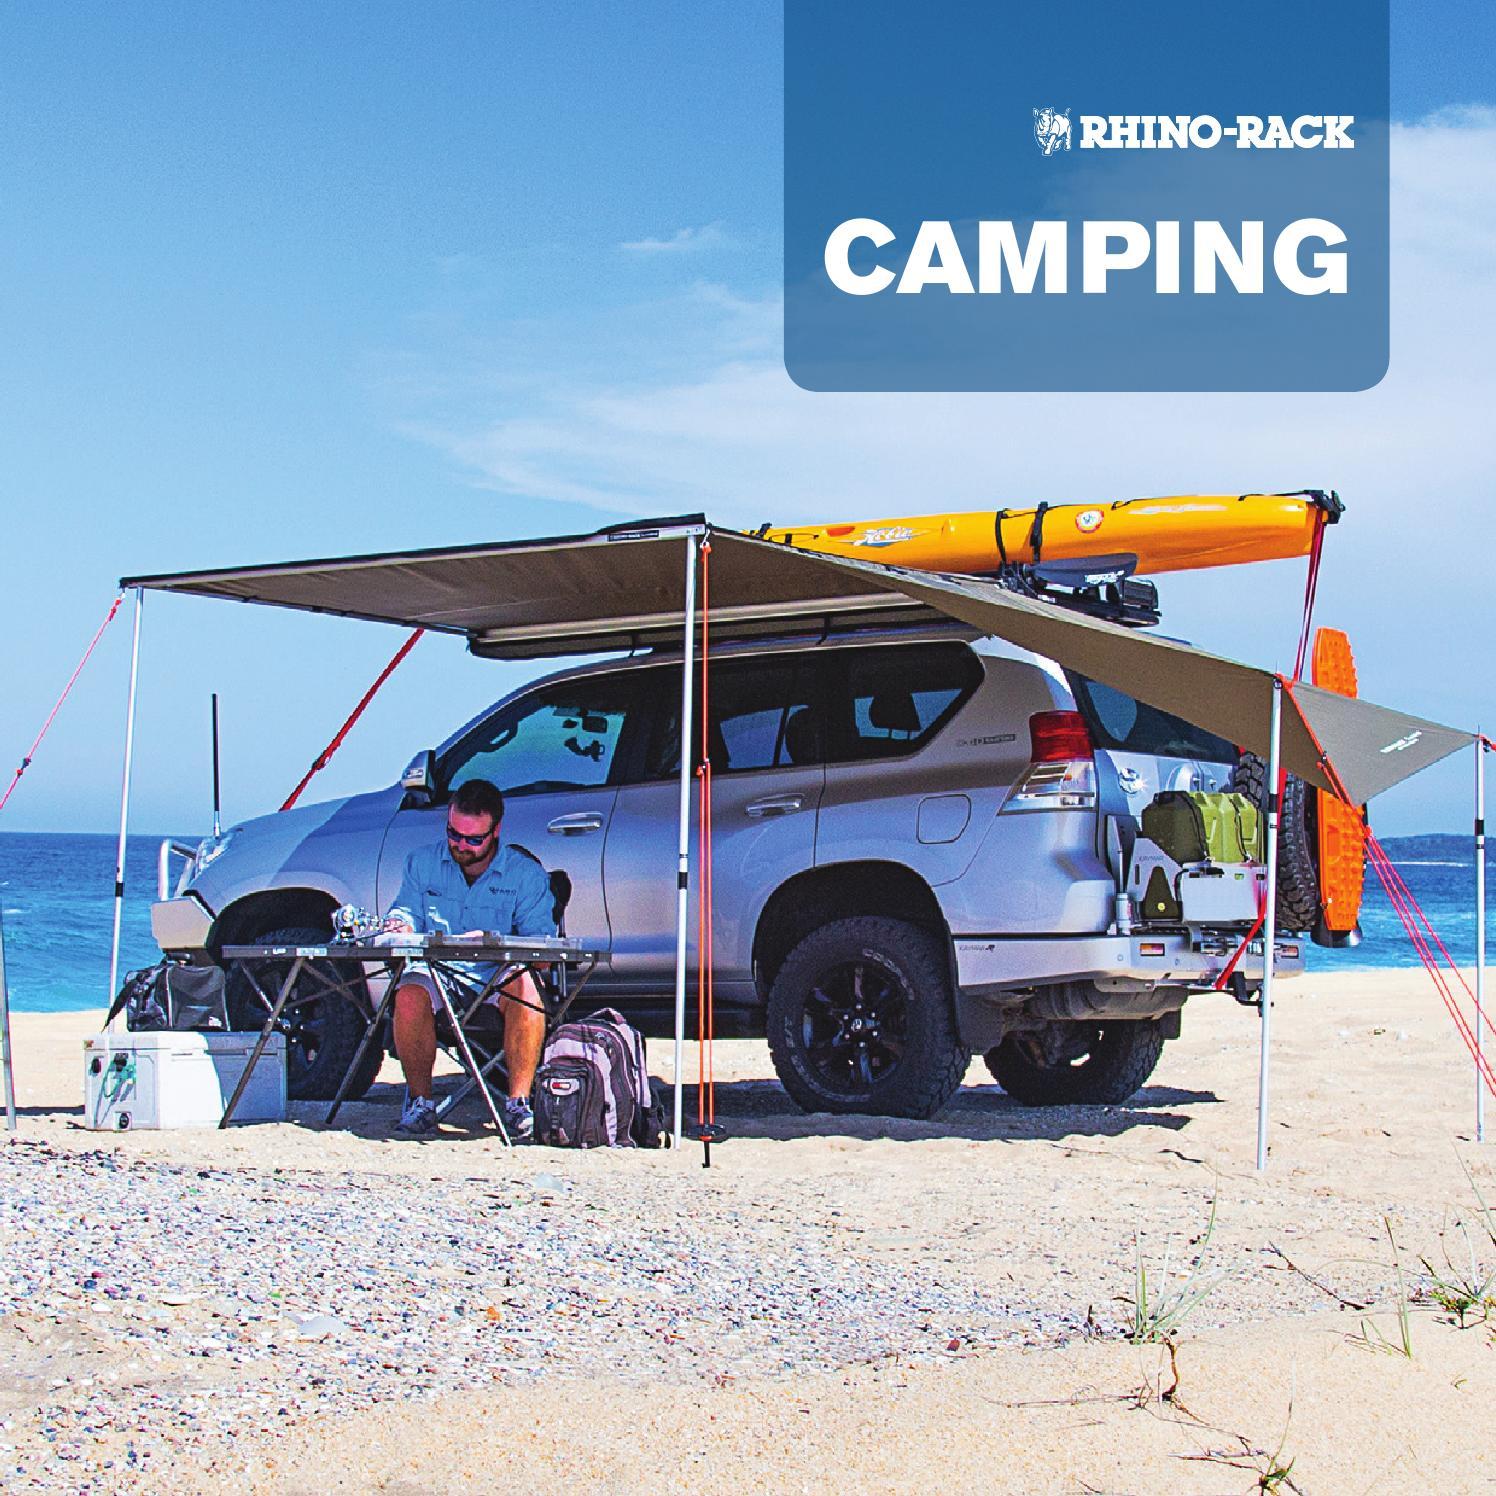 rhino rack camping brochure 2015 by